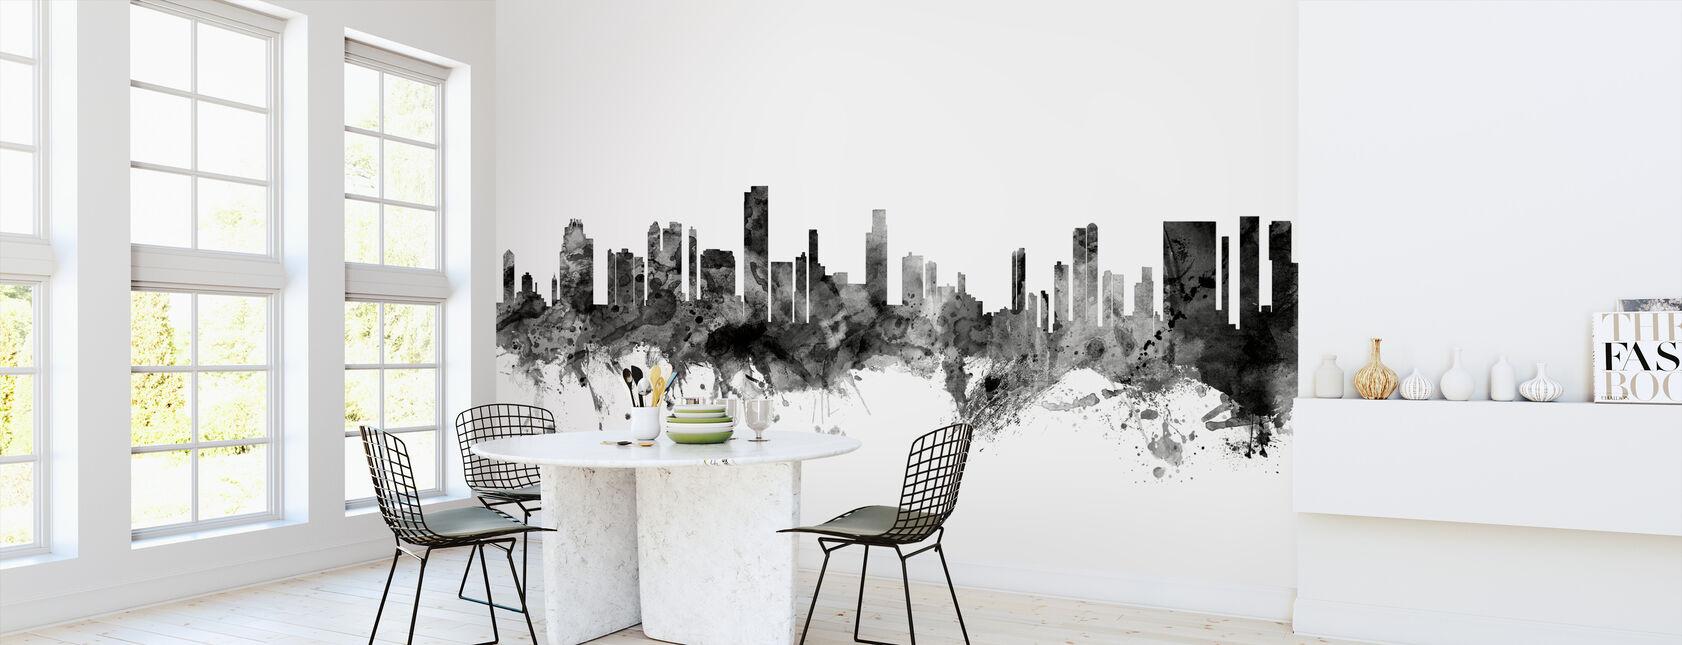 Honolulu Hawaii Skyline Black - Wallpaper - Kitchen